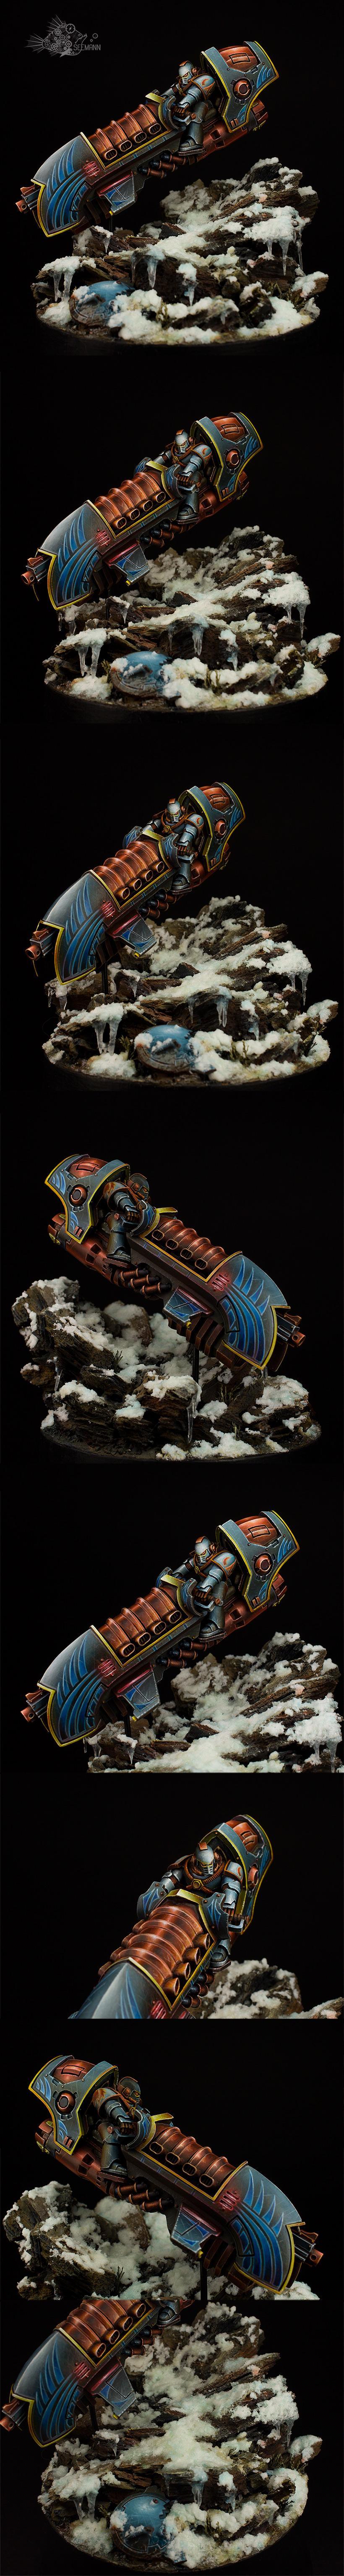 Horus Heresy, Jetbike, Pro-painted, Space Marines